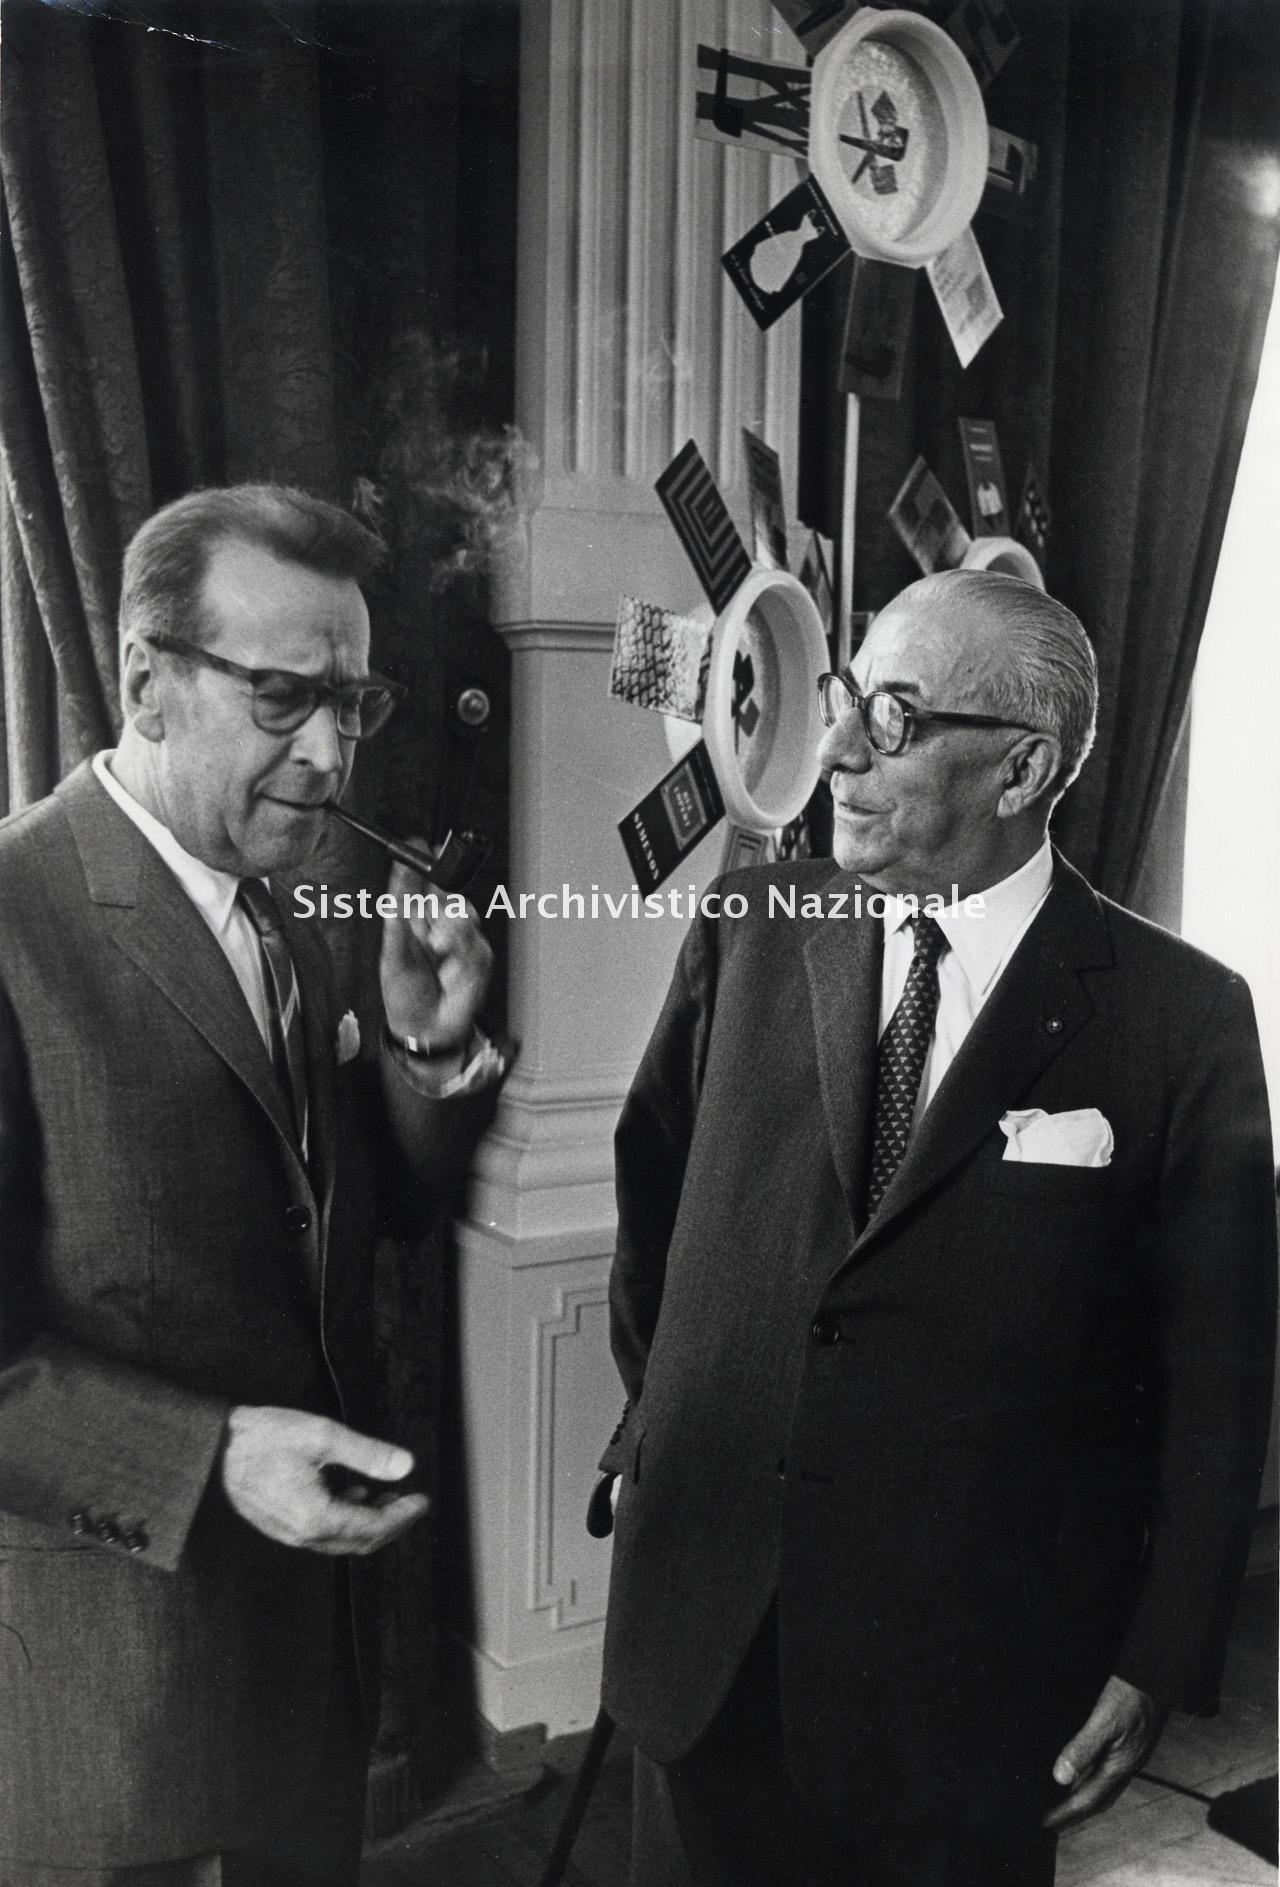 Mondadori, Arnoldo Mondadori con Georges Simenon, anni '50